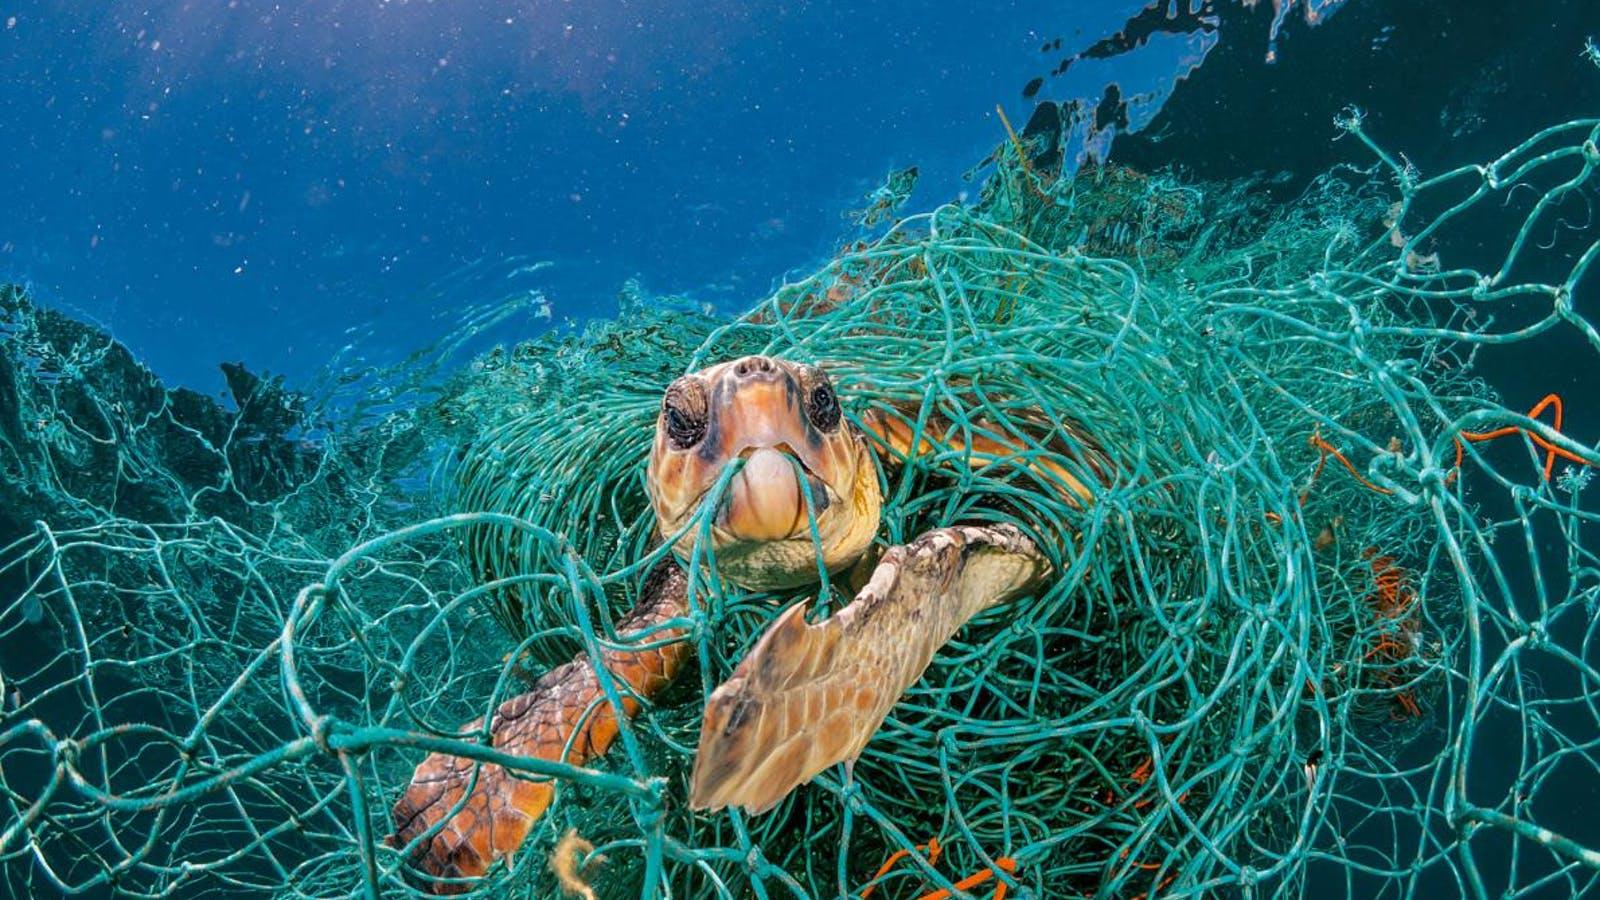 plastic-waste-single-use-worldwide-consumption-animals-2-adapt-1190-1